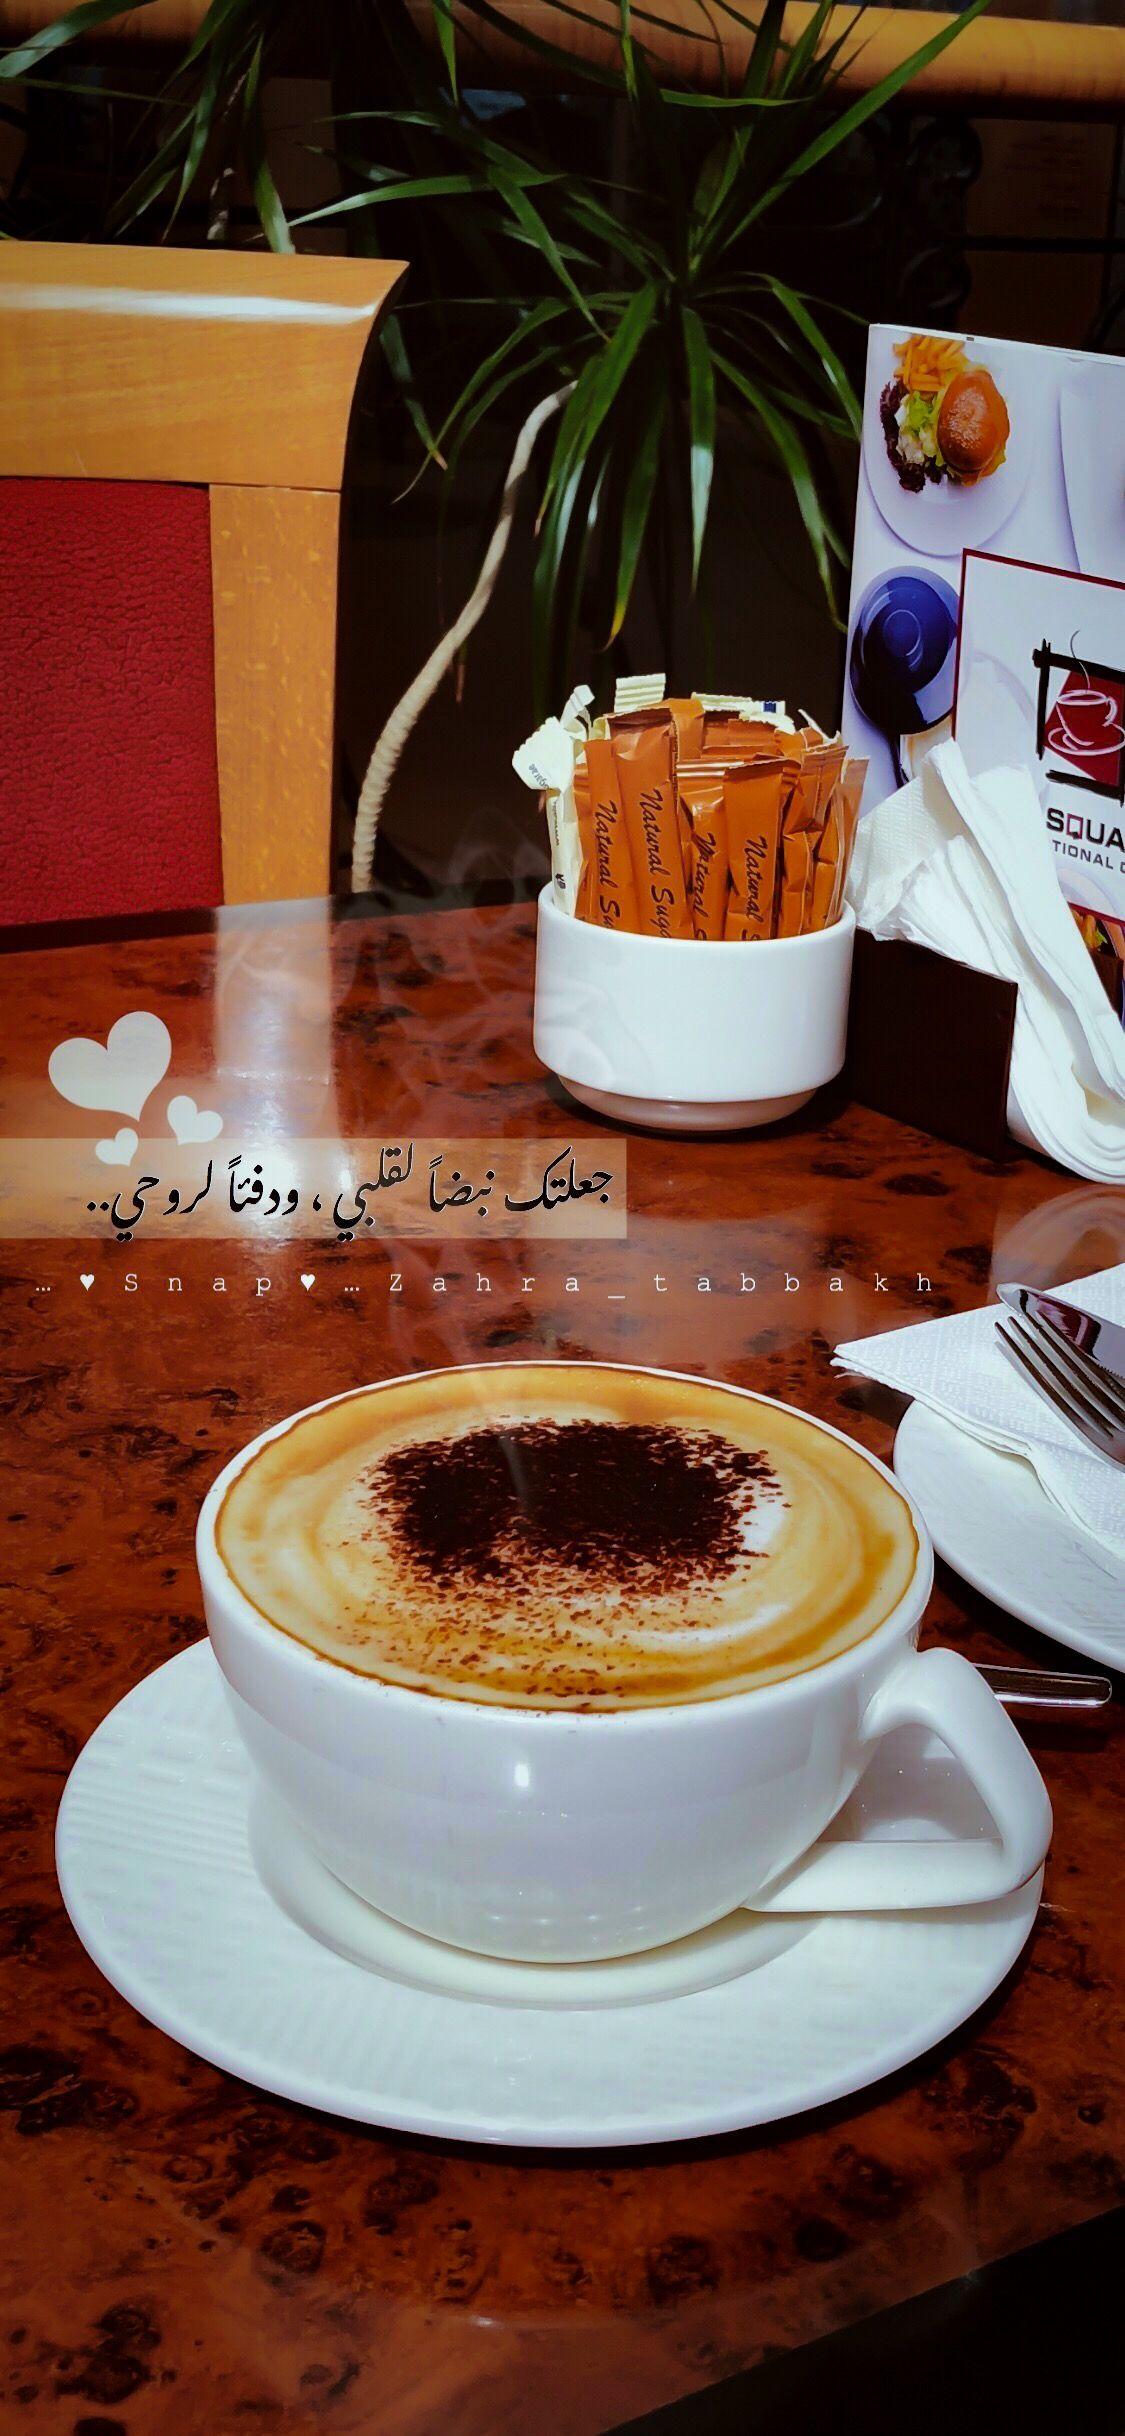 Coffee قهوة قهوه قهوتي هدوء سنابات سناب صباح مساء رمزيات